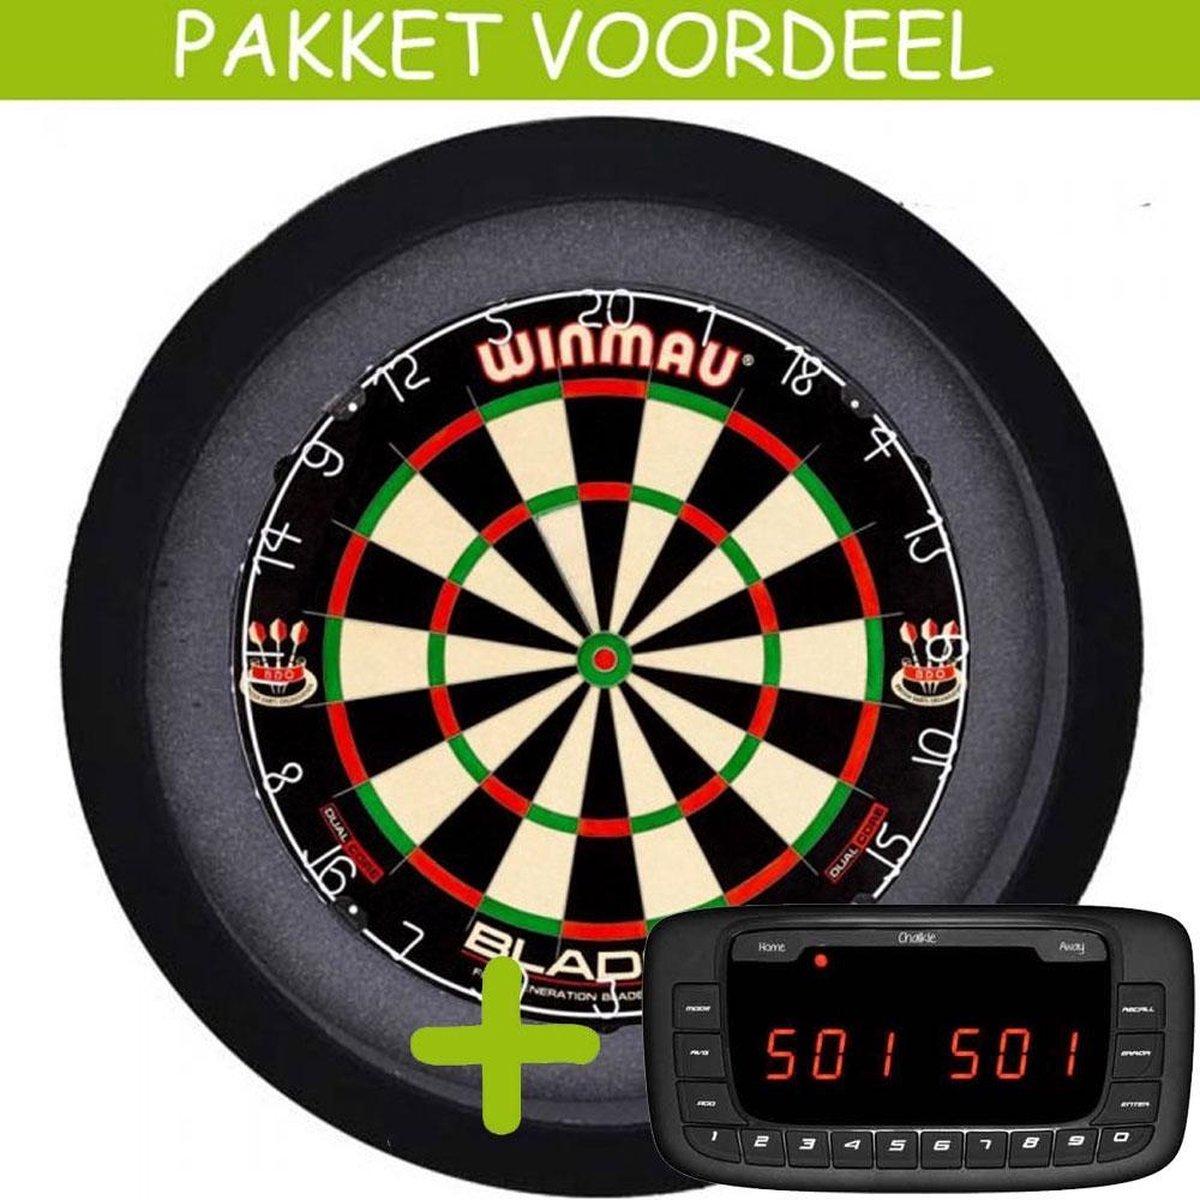 Elektronisch Dart Scorebord VoordeelPakket (Chalkie ) - Dual Core - Dartbordverlichting Basic (Zwart)